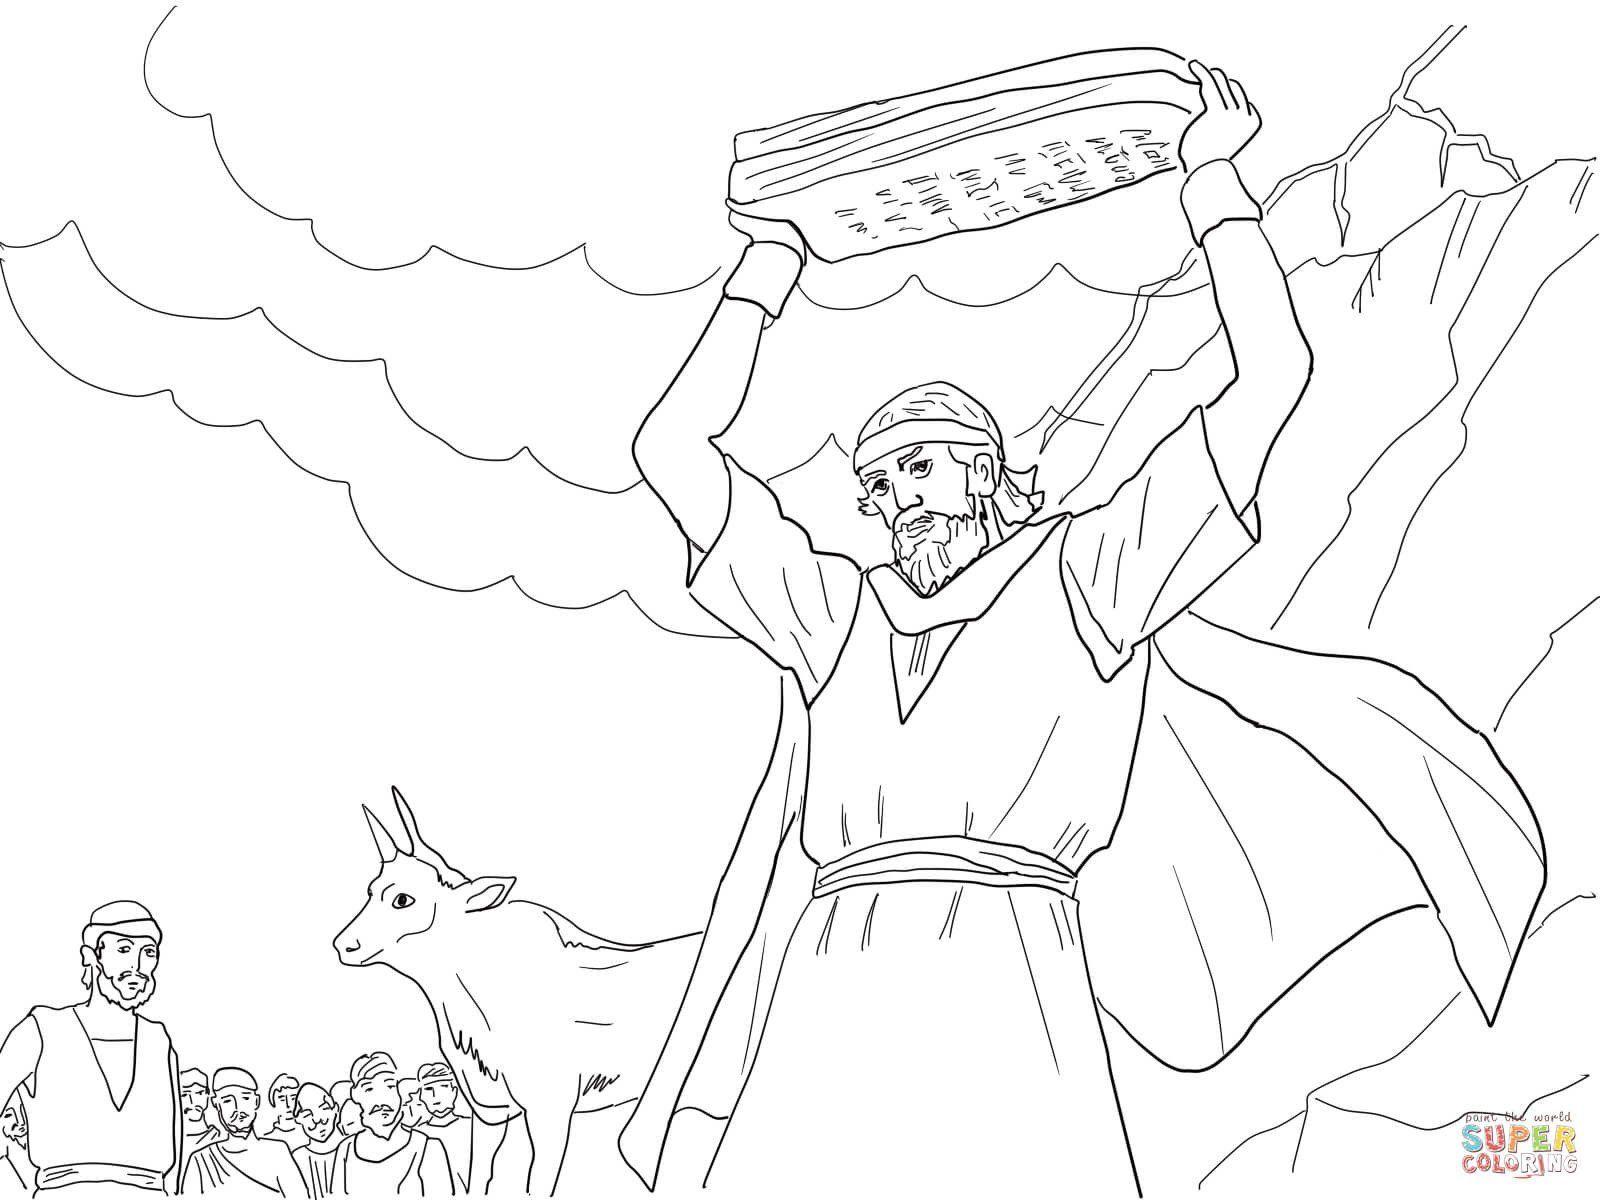 Baby Moses Coloring Page New Ten Mandments Printable Coloring Sheets 10 Pages Catholic Tablets Golden Calf Bible Coloring Pages Coloring Pages